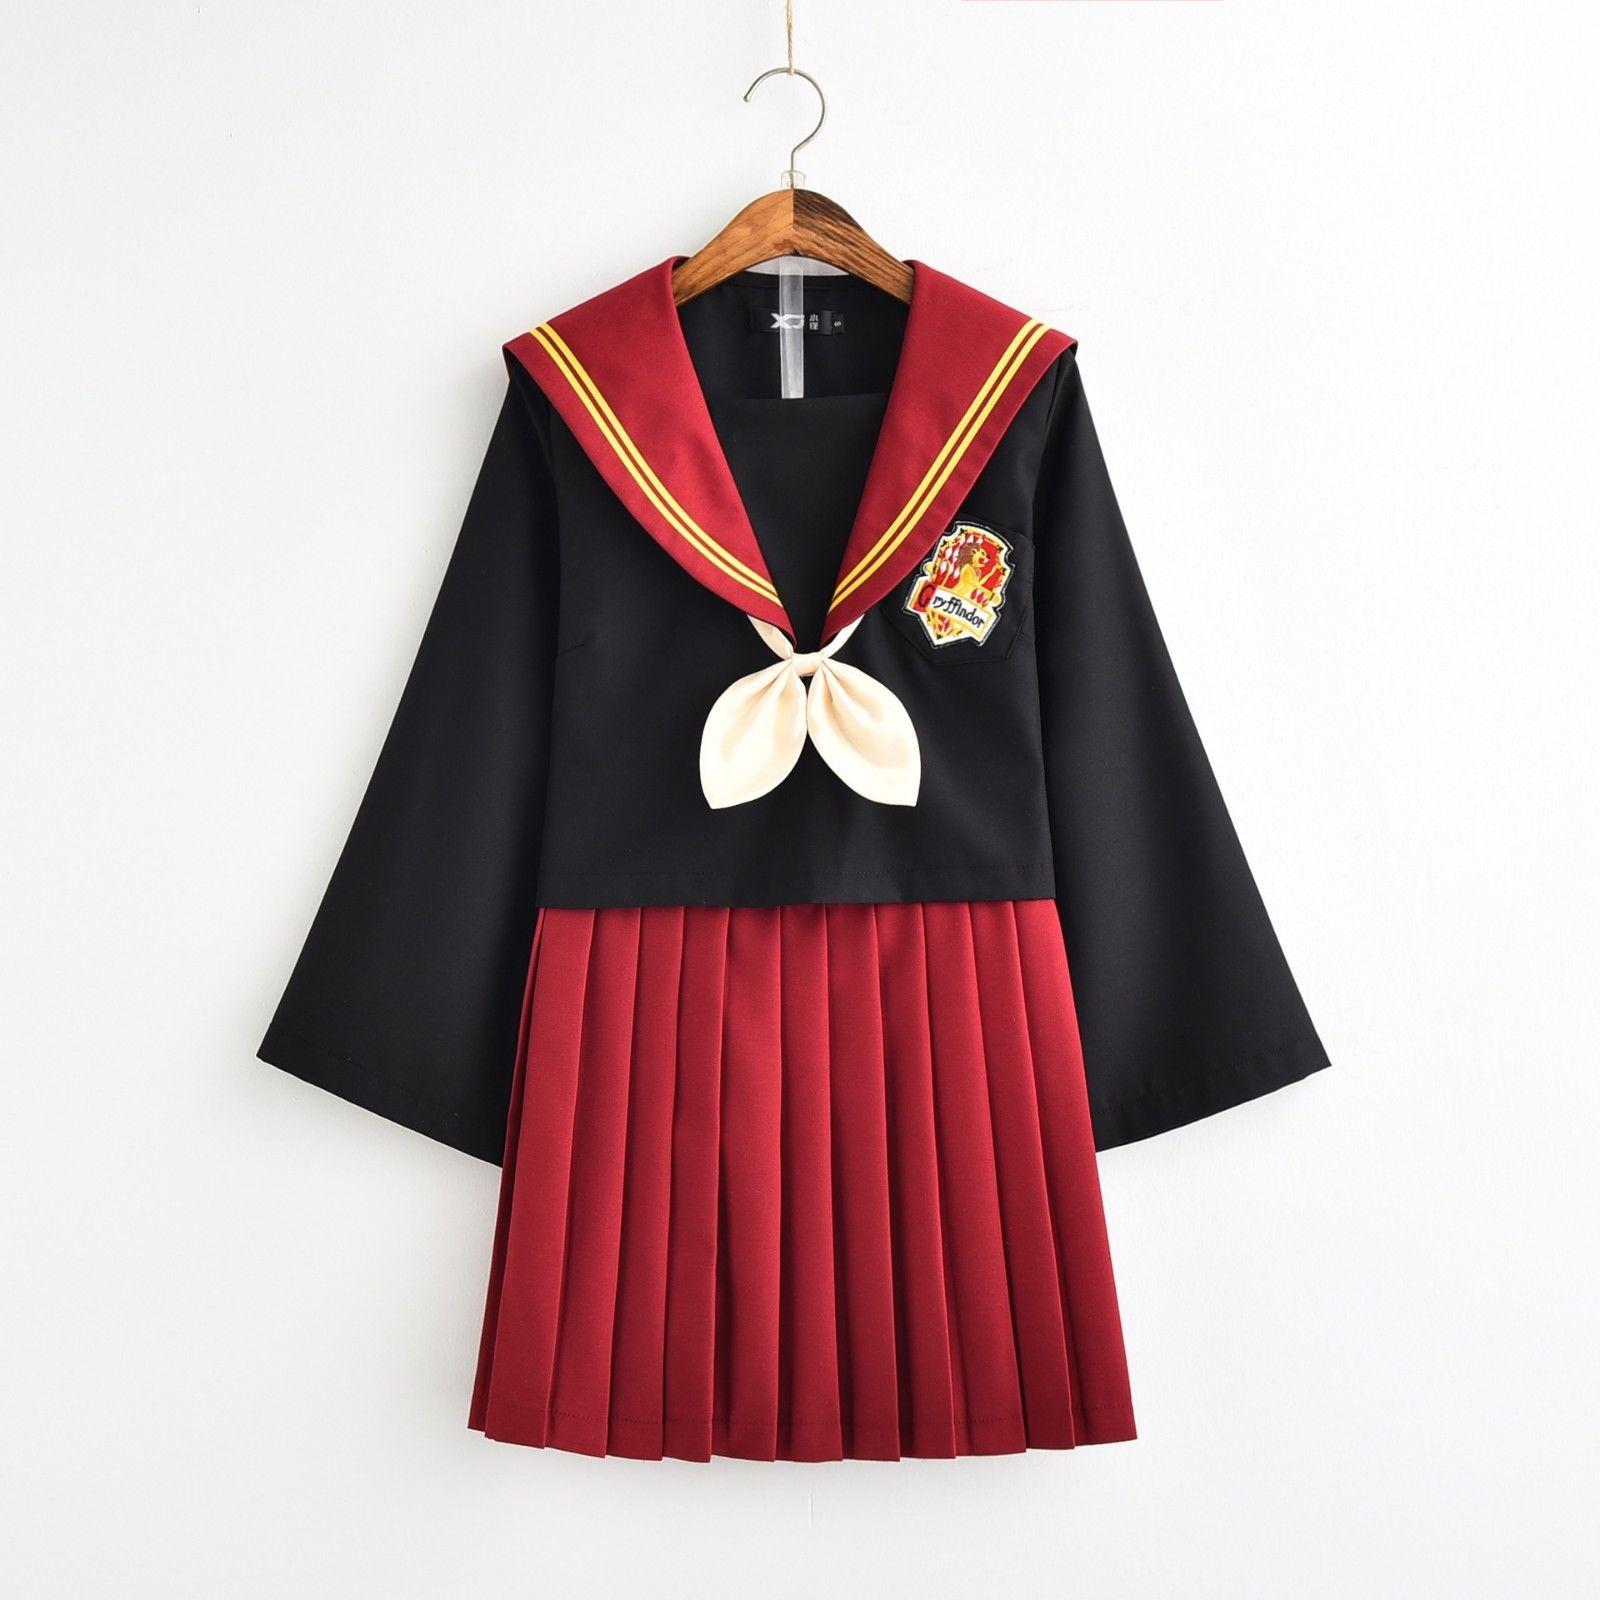 Harri Potter gryffondor étudiant école uniforme marin costume JK uniforme Cosplay